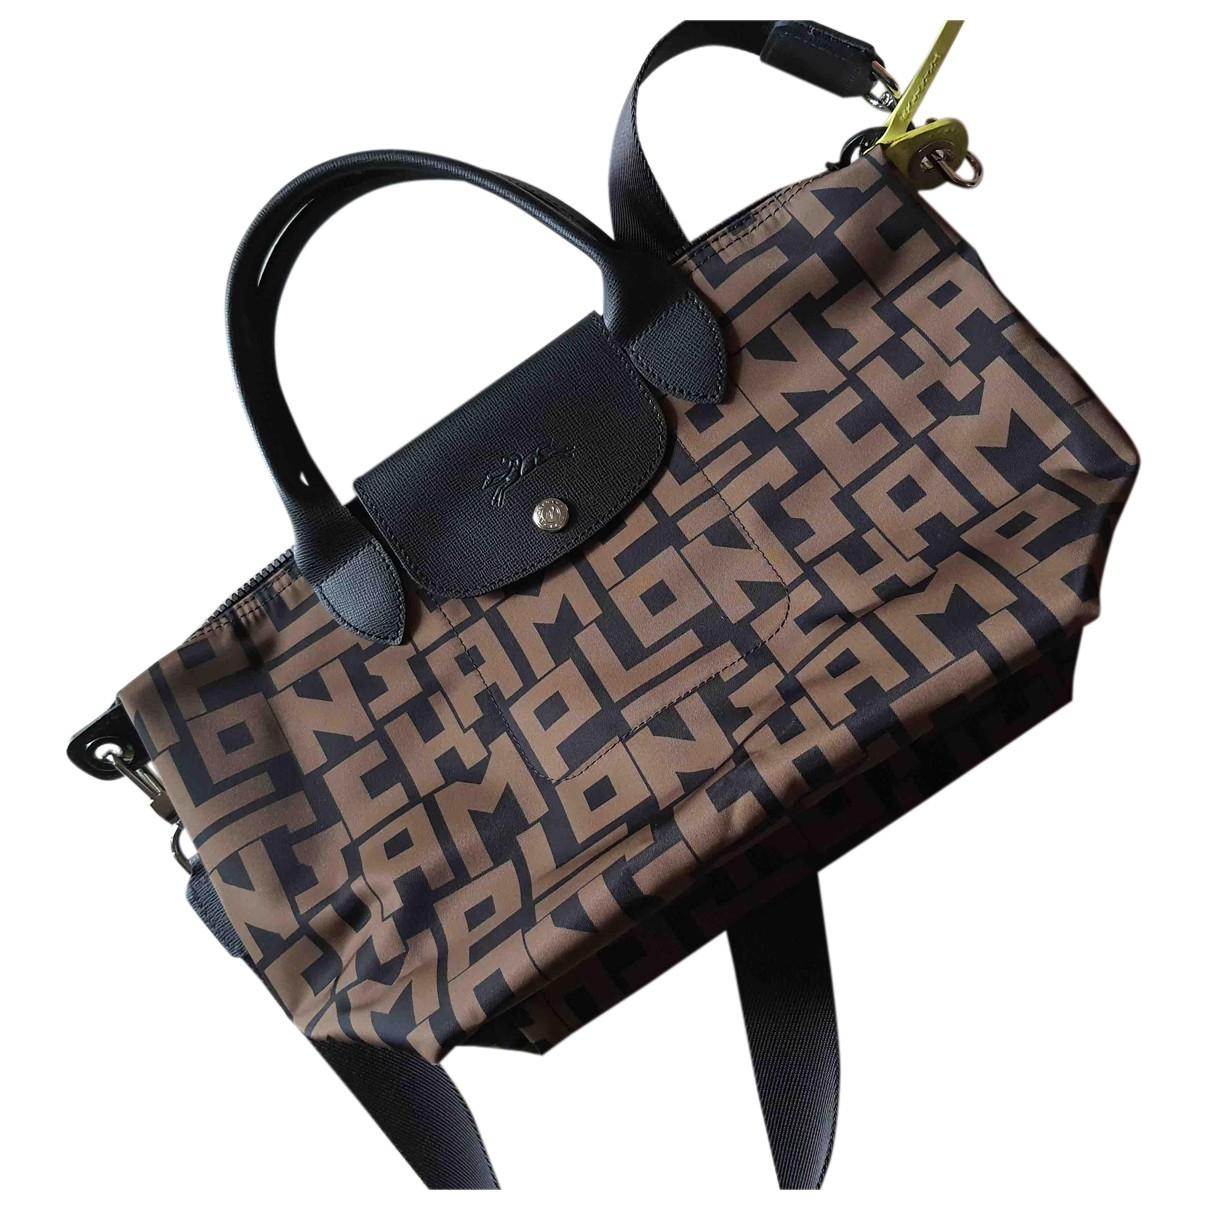 Longchamp - Sac a main   pour femme en toile - kaki